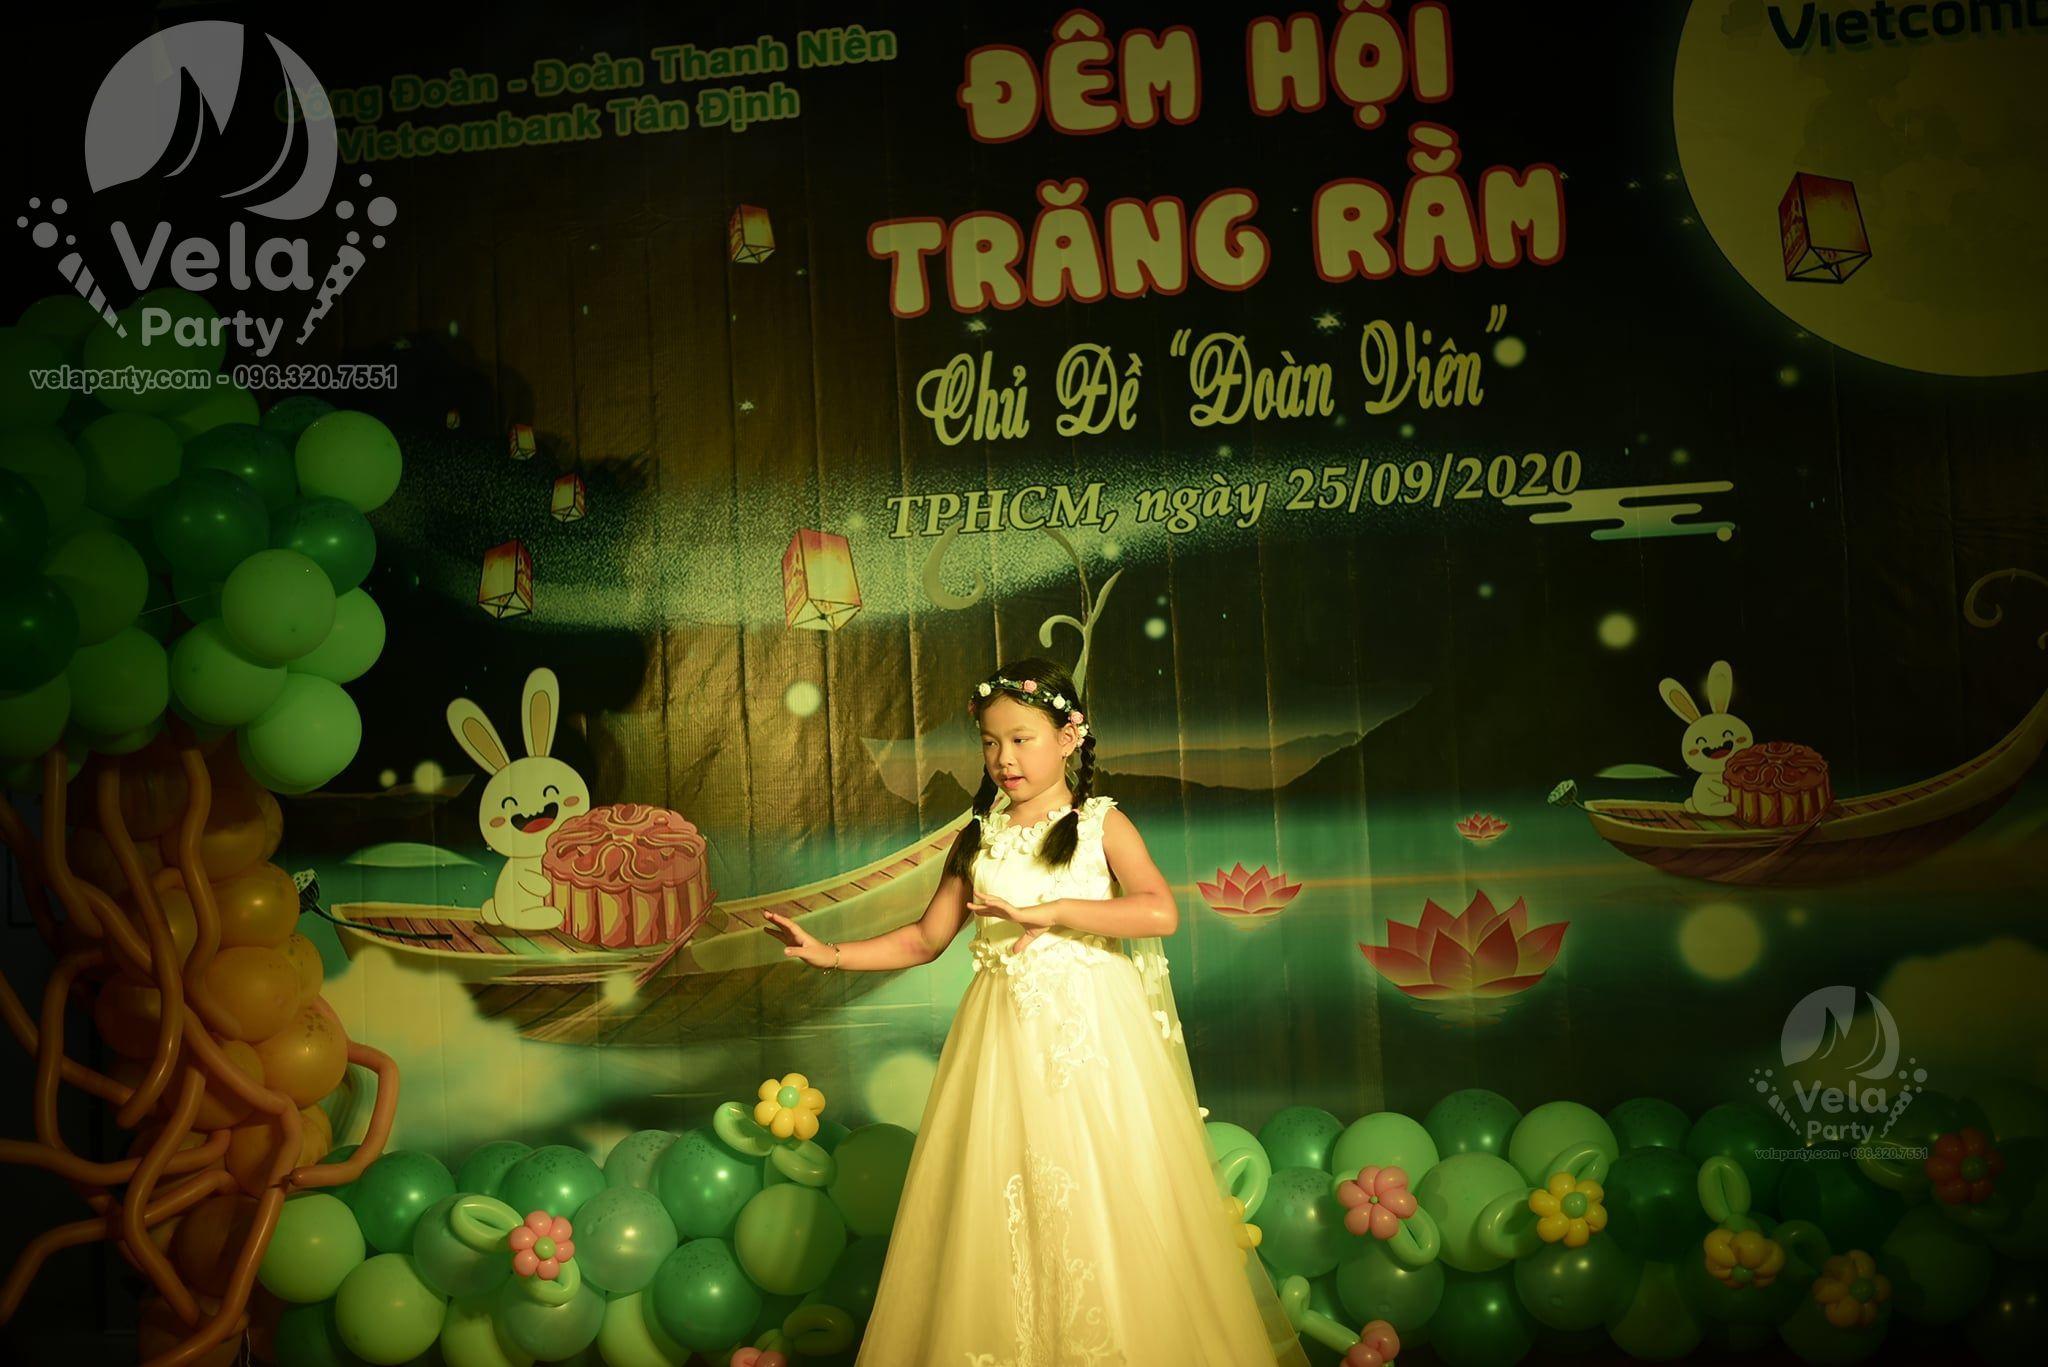 to-chuc-trung-thu-tron-goi-cho-ngan-hang-vietcombank-tphcm9